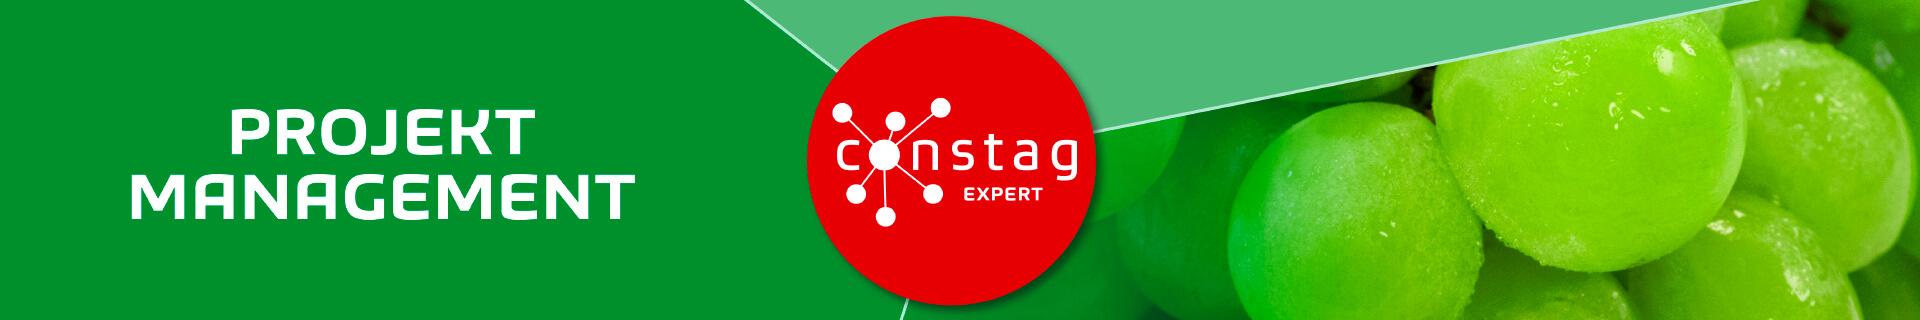 Constag Produkte Projekt Management EXPERT